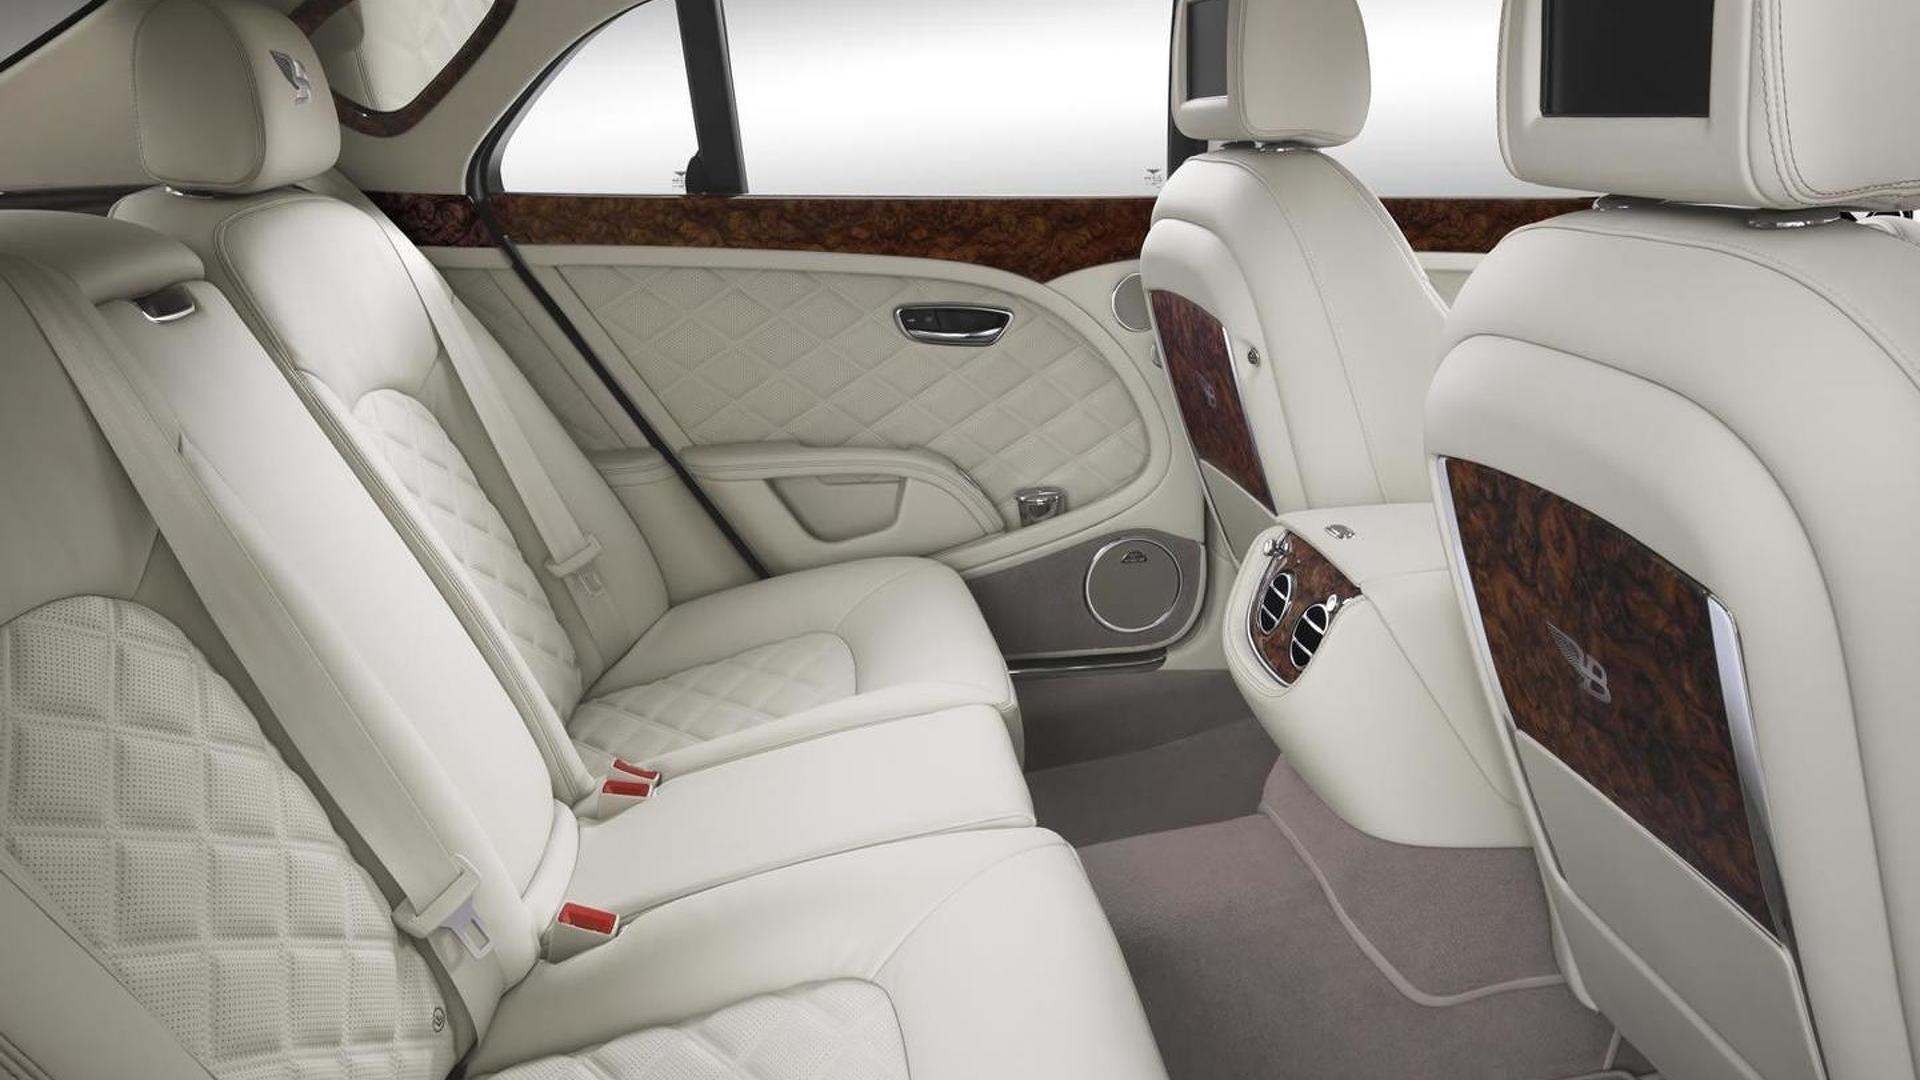 Bentley Mulsanne Birkin limited edition announced for Europe